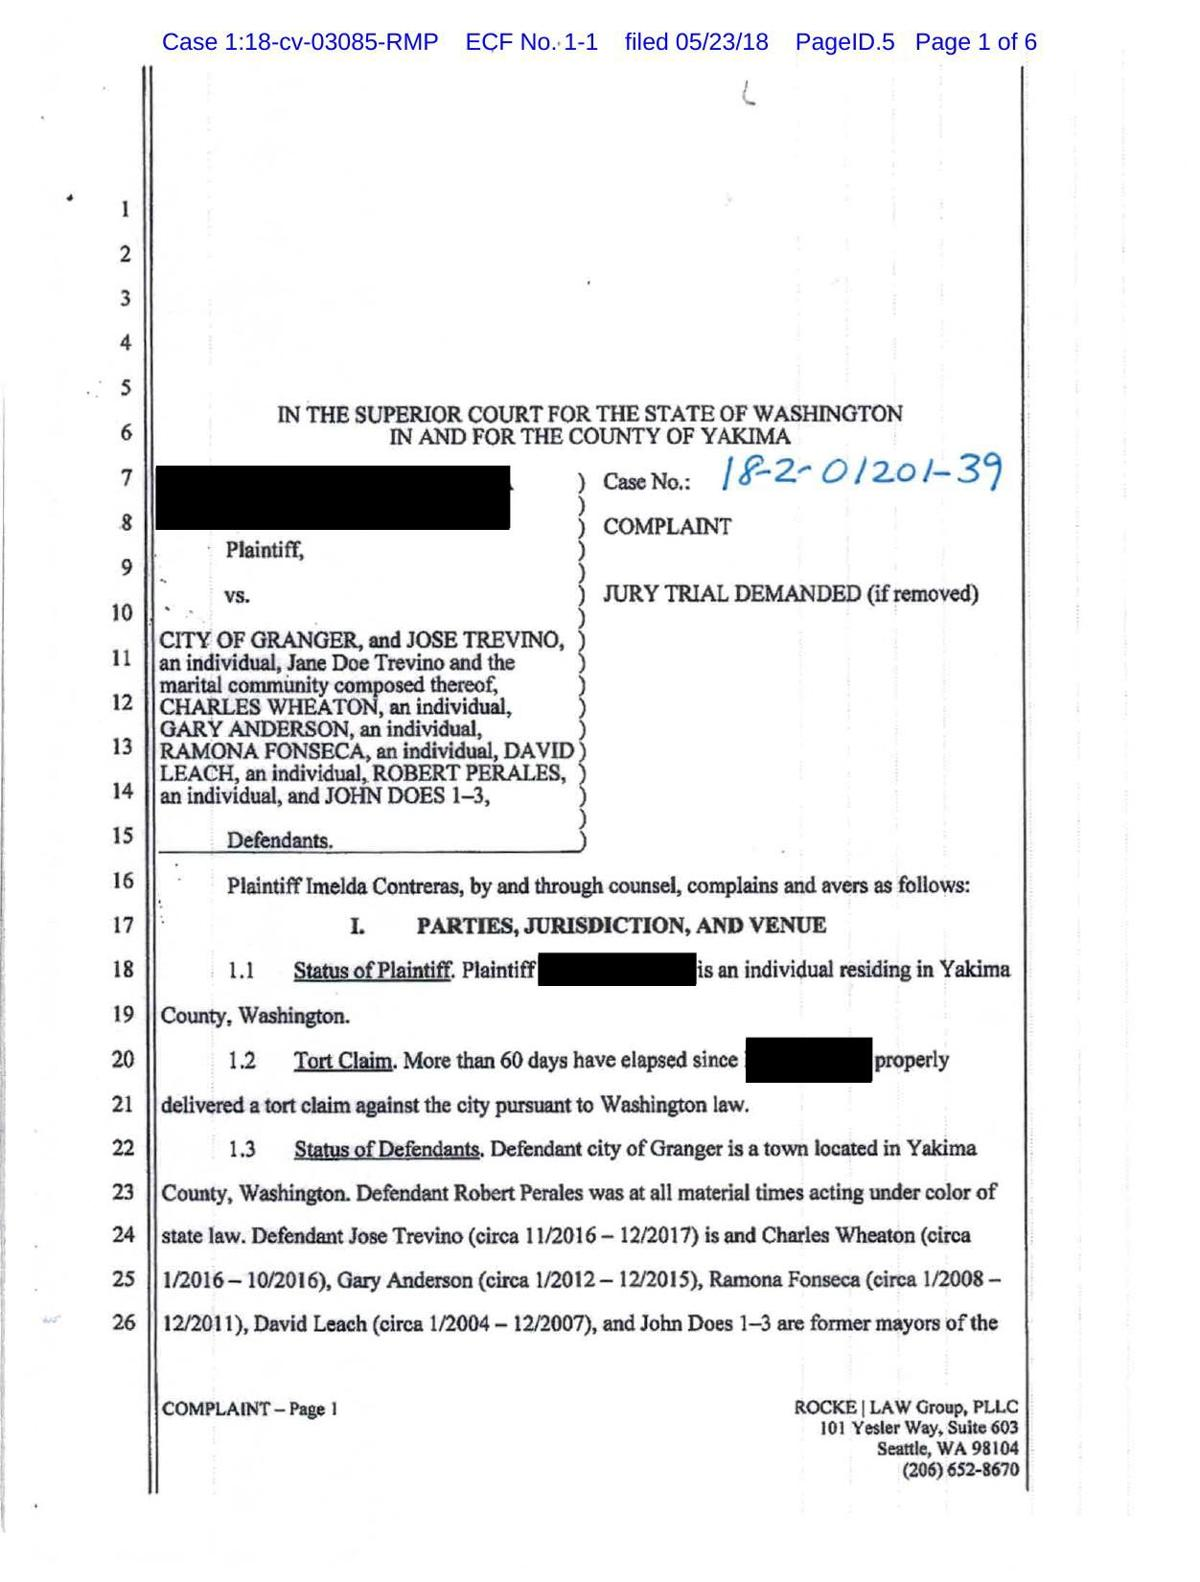 Lawsuit against Granger